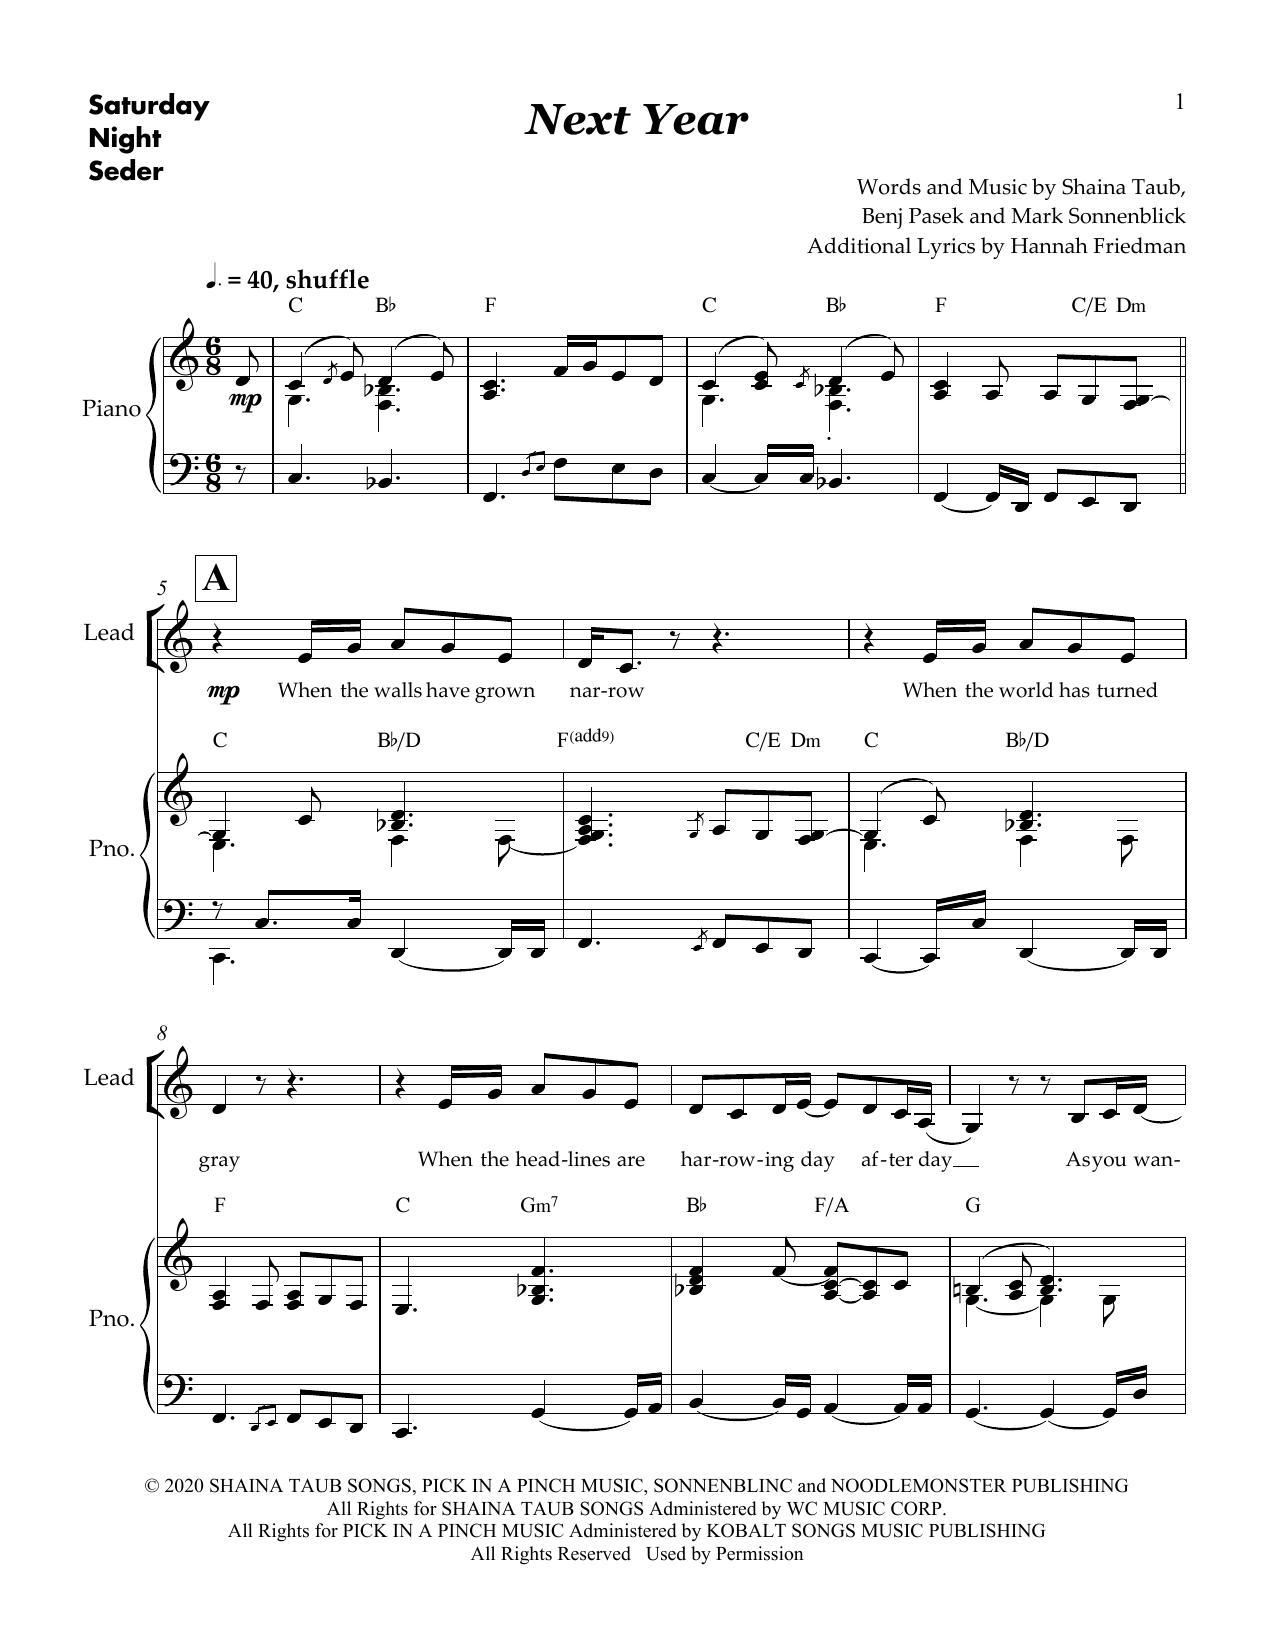 Shaina Taub & Skylar Astin Next Year (from Saturday Night Seder) sheet music notes and chords. Download Printable PDF.